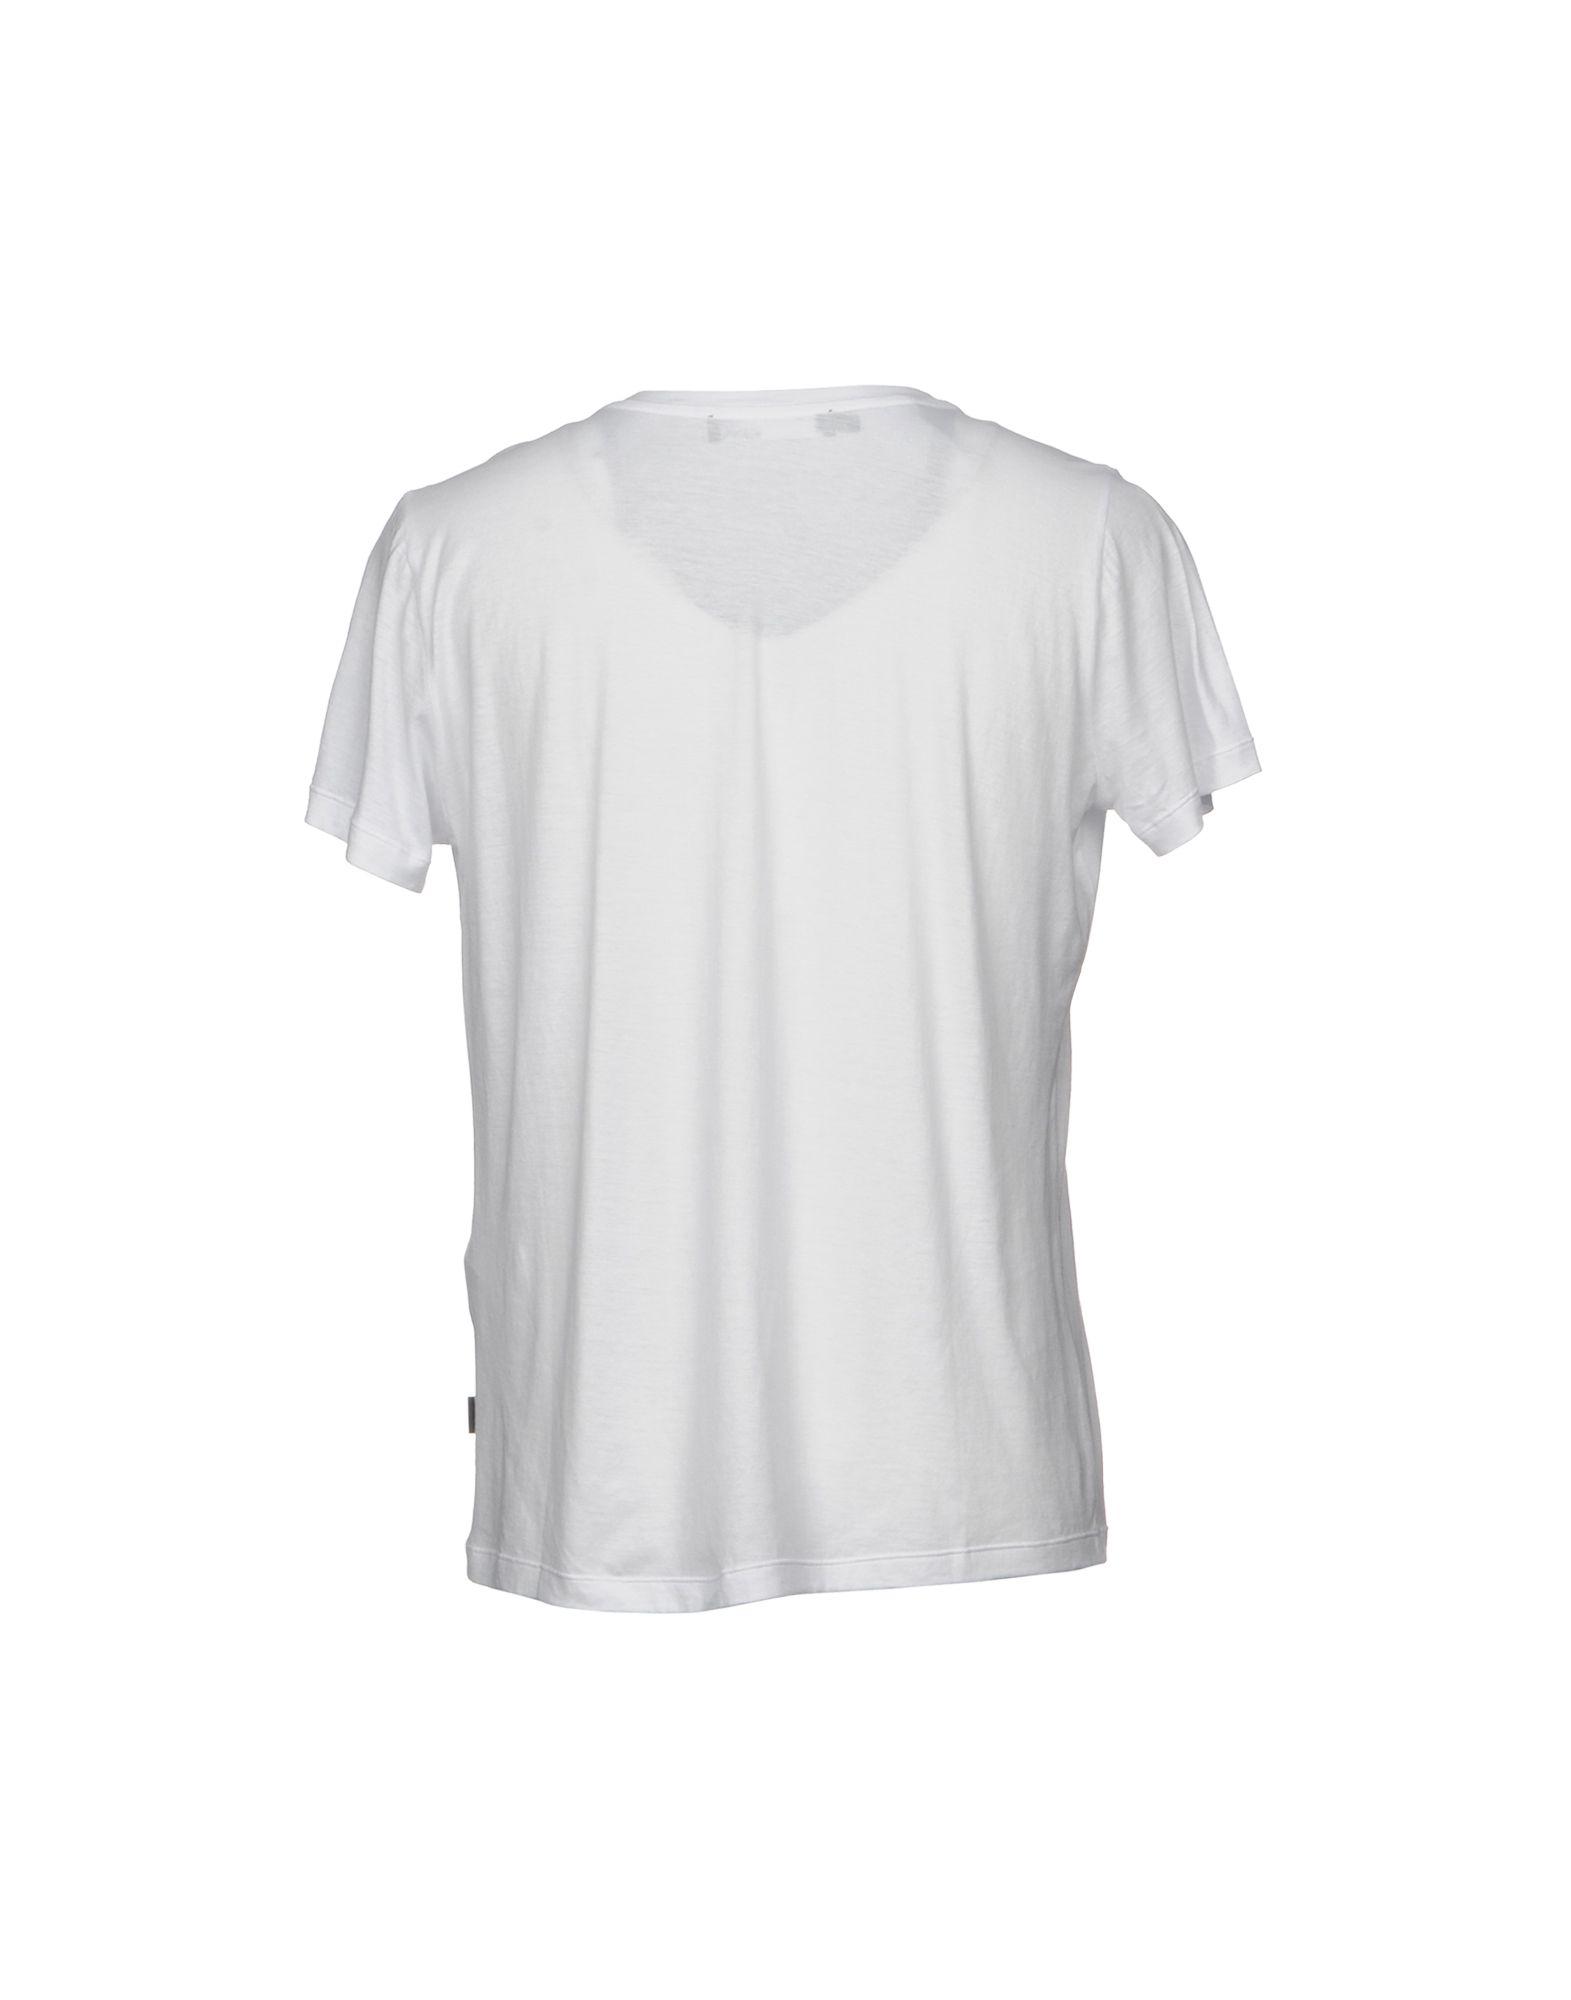 T-Shirt Love Moschino Uomo - 12088762DV 12088762DV - 9f33a3